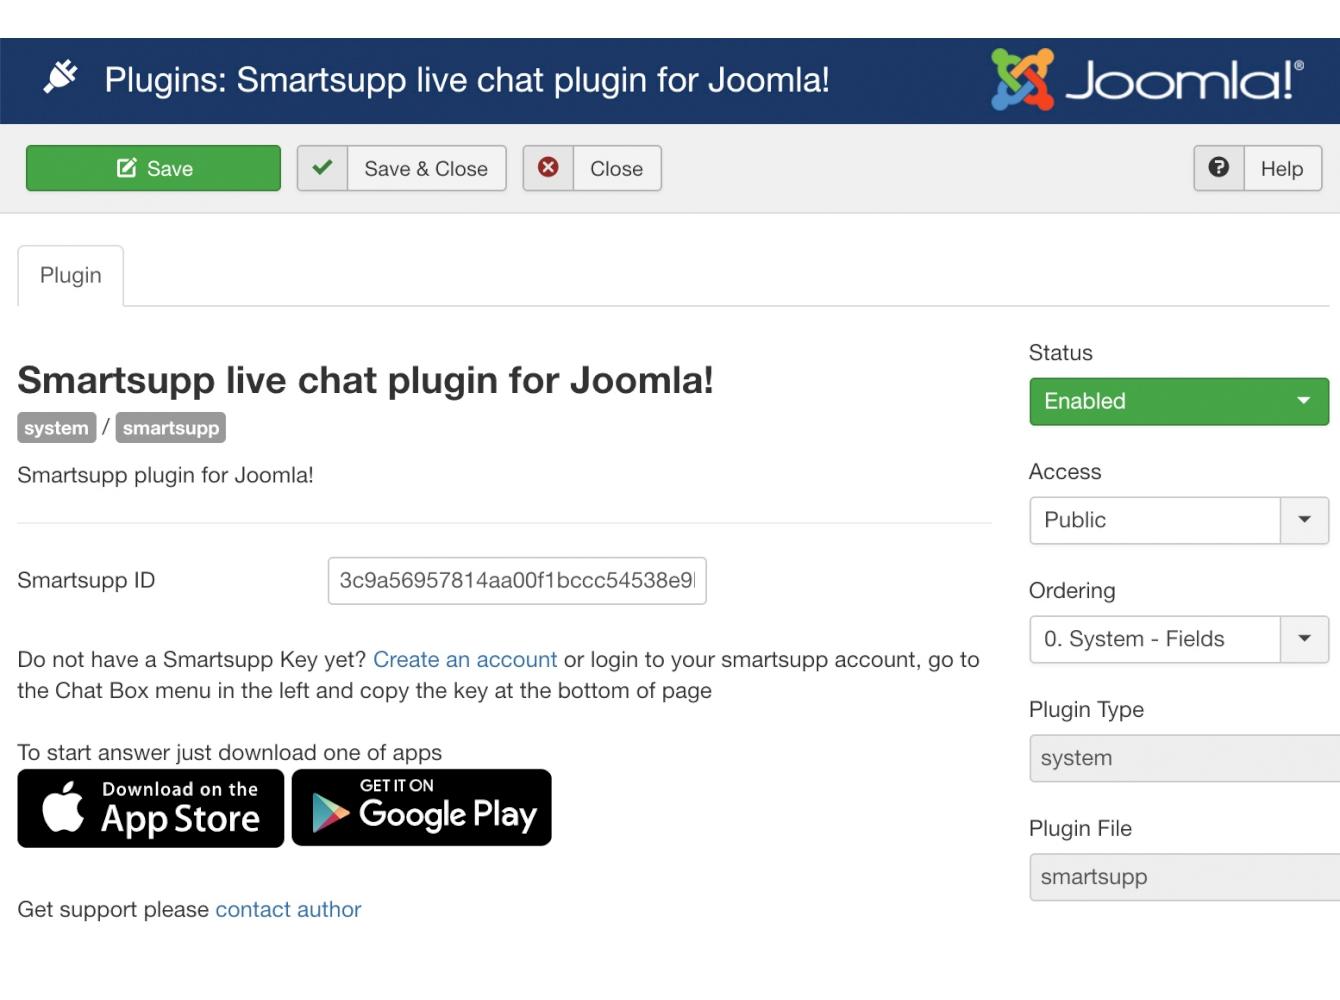 Joomla live chat - Smartsupp plugin